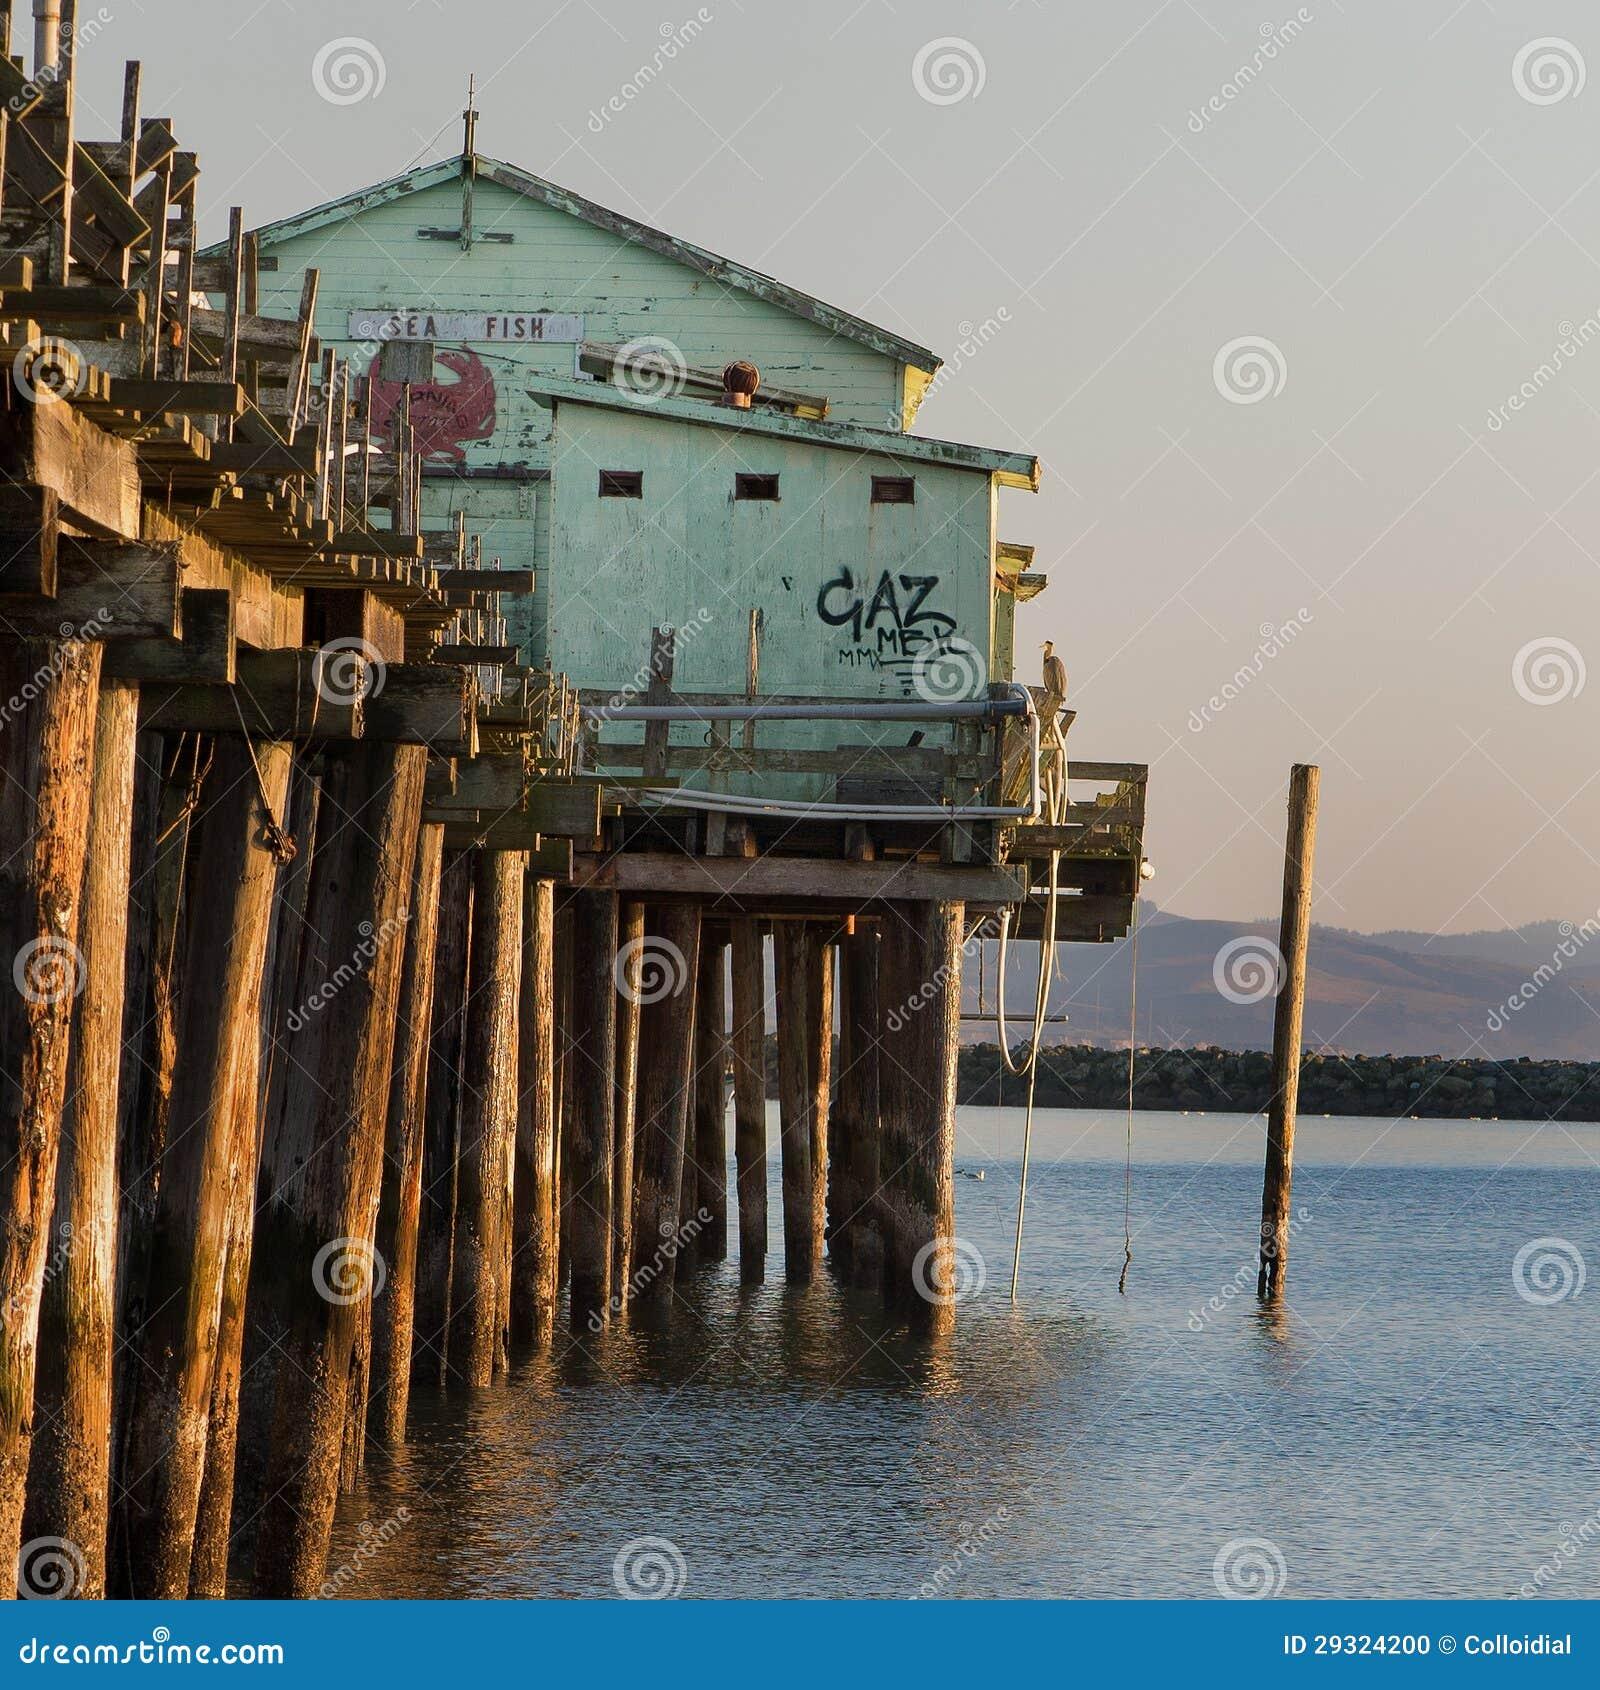 Pillar point pier stock photo image 29324200 for Half moon bay pier fishing